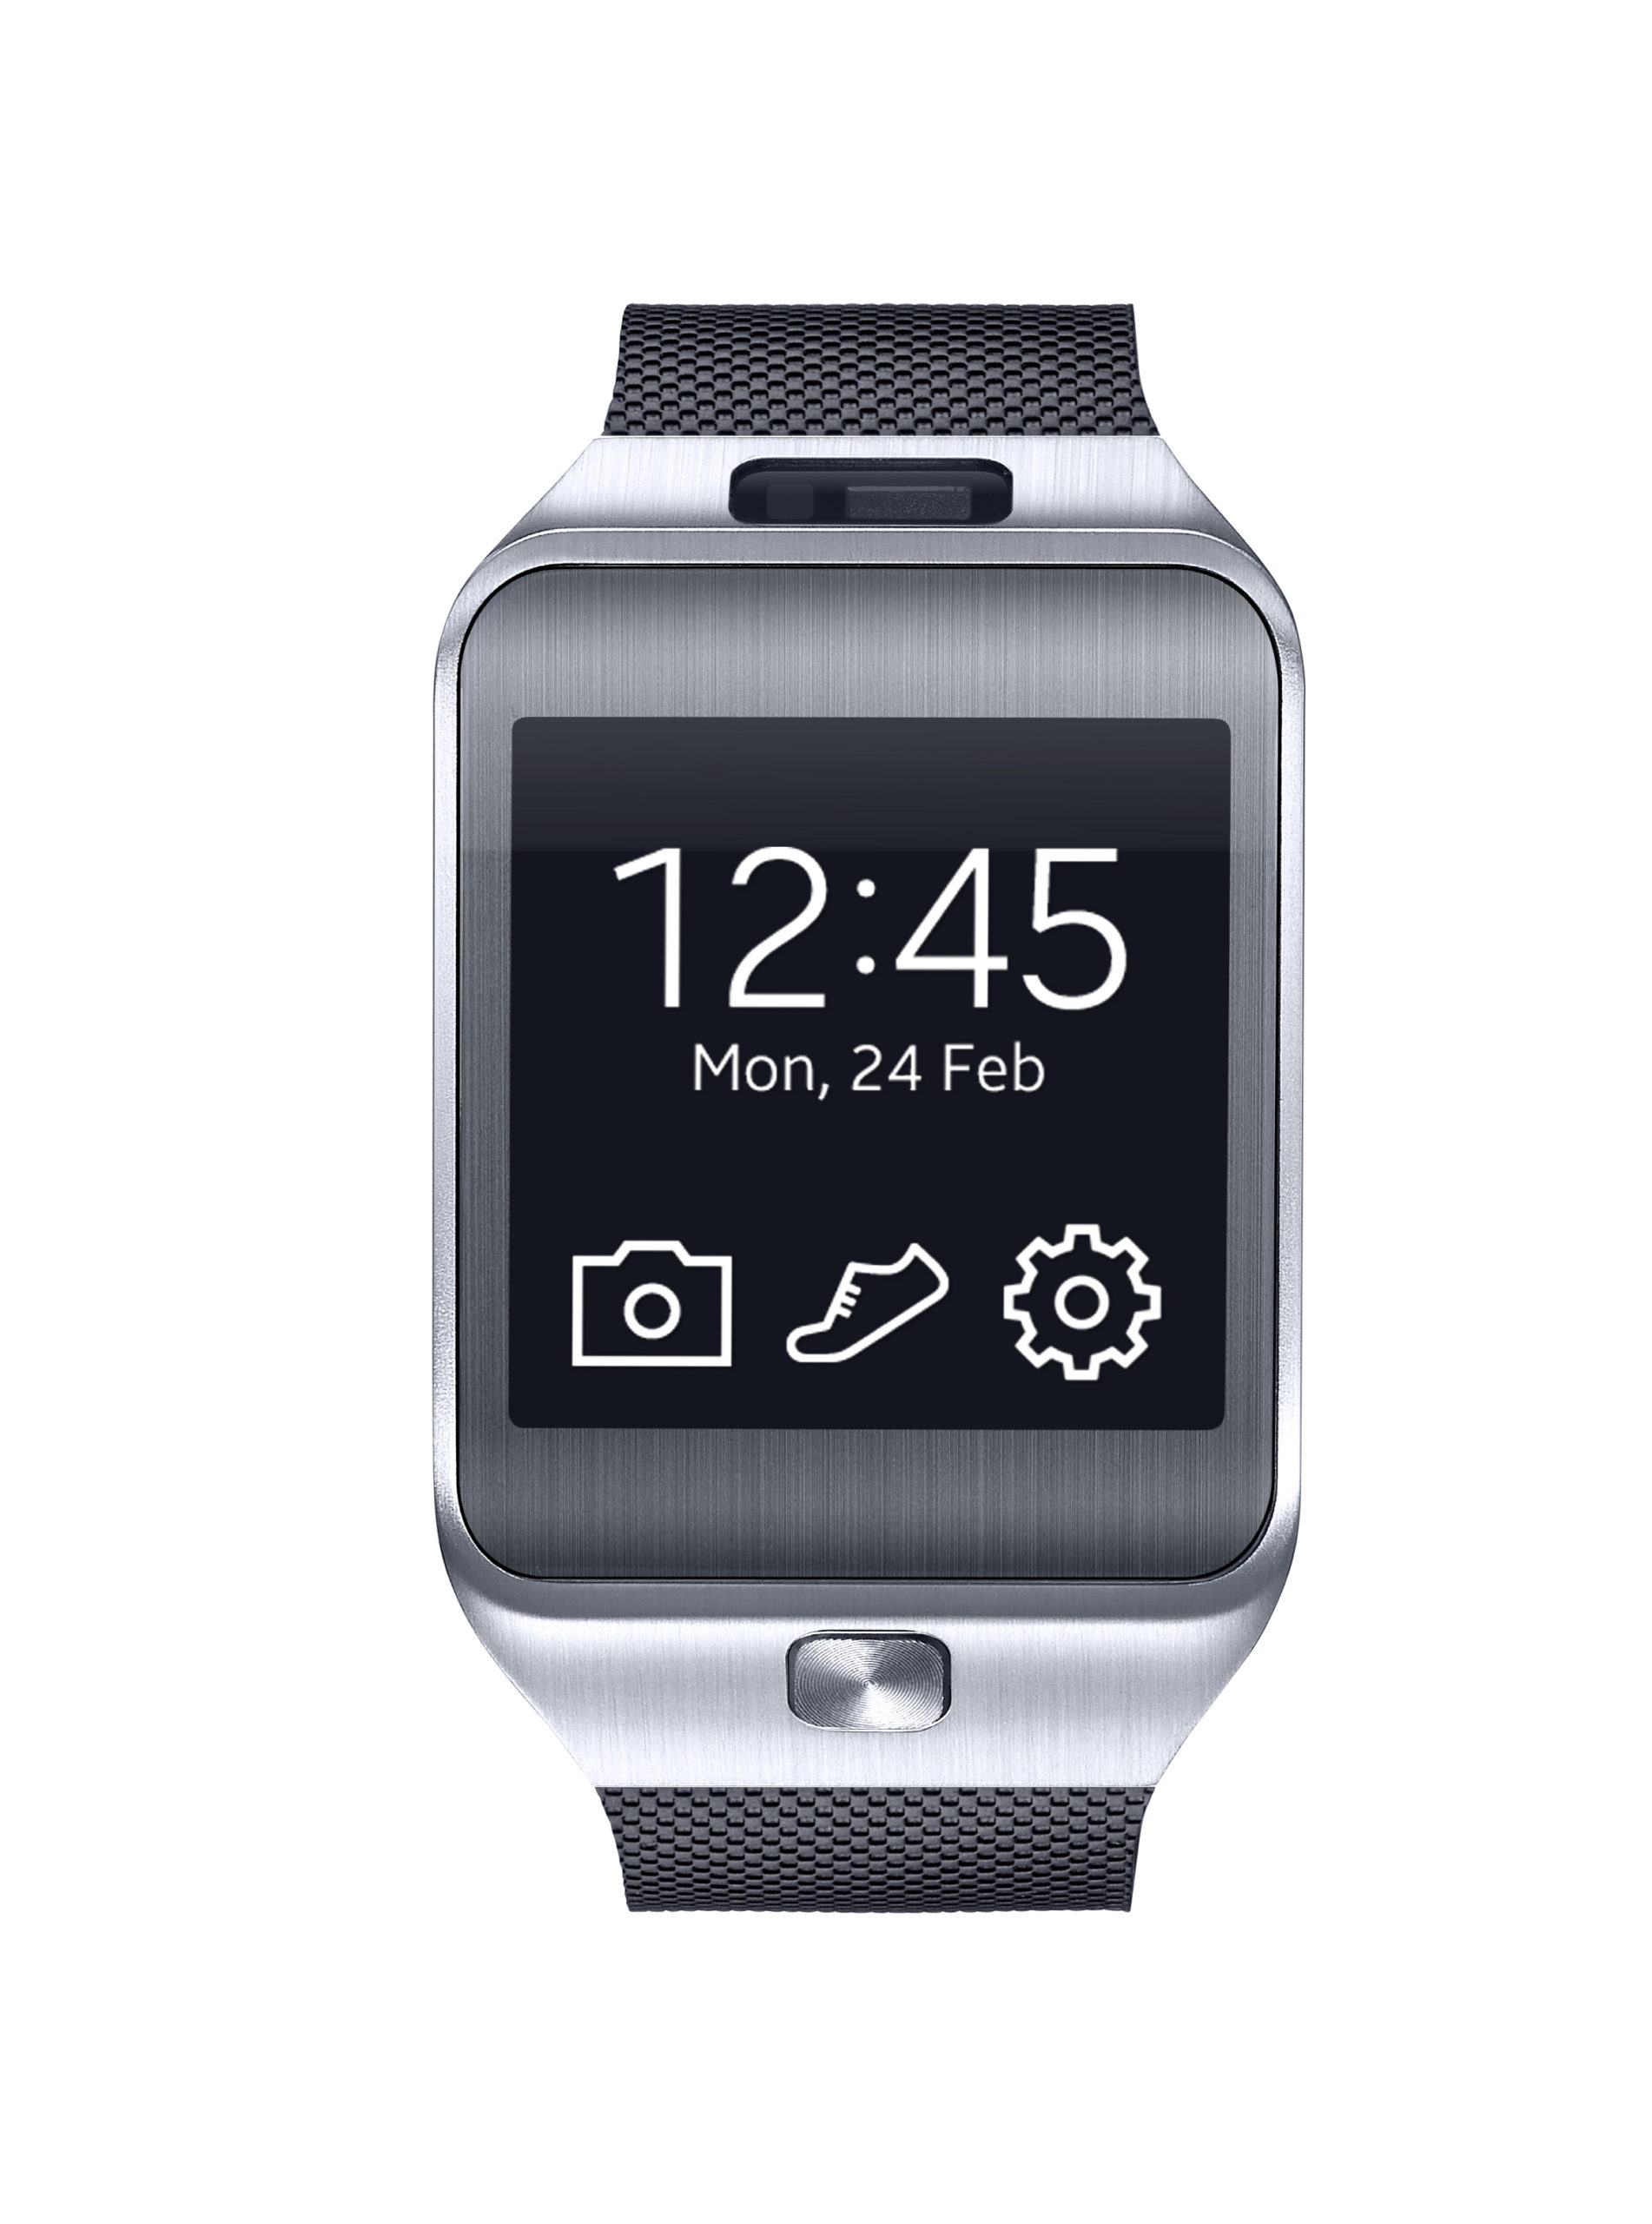 Samsung Galaxy Gear 2, Samsung Galaxy Gear Neo